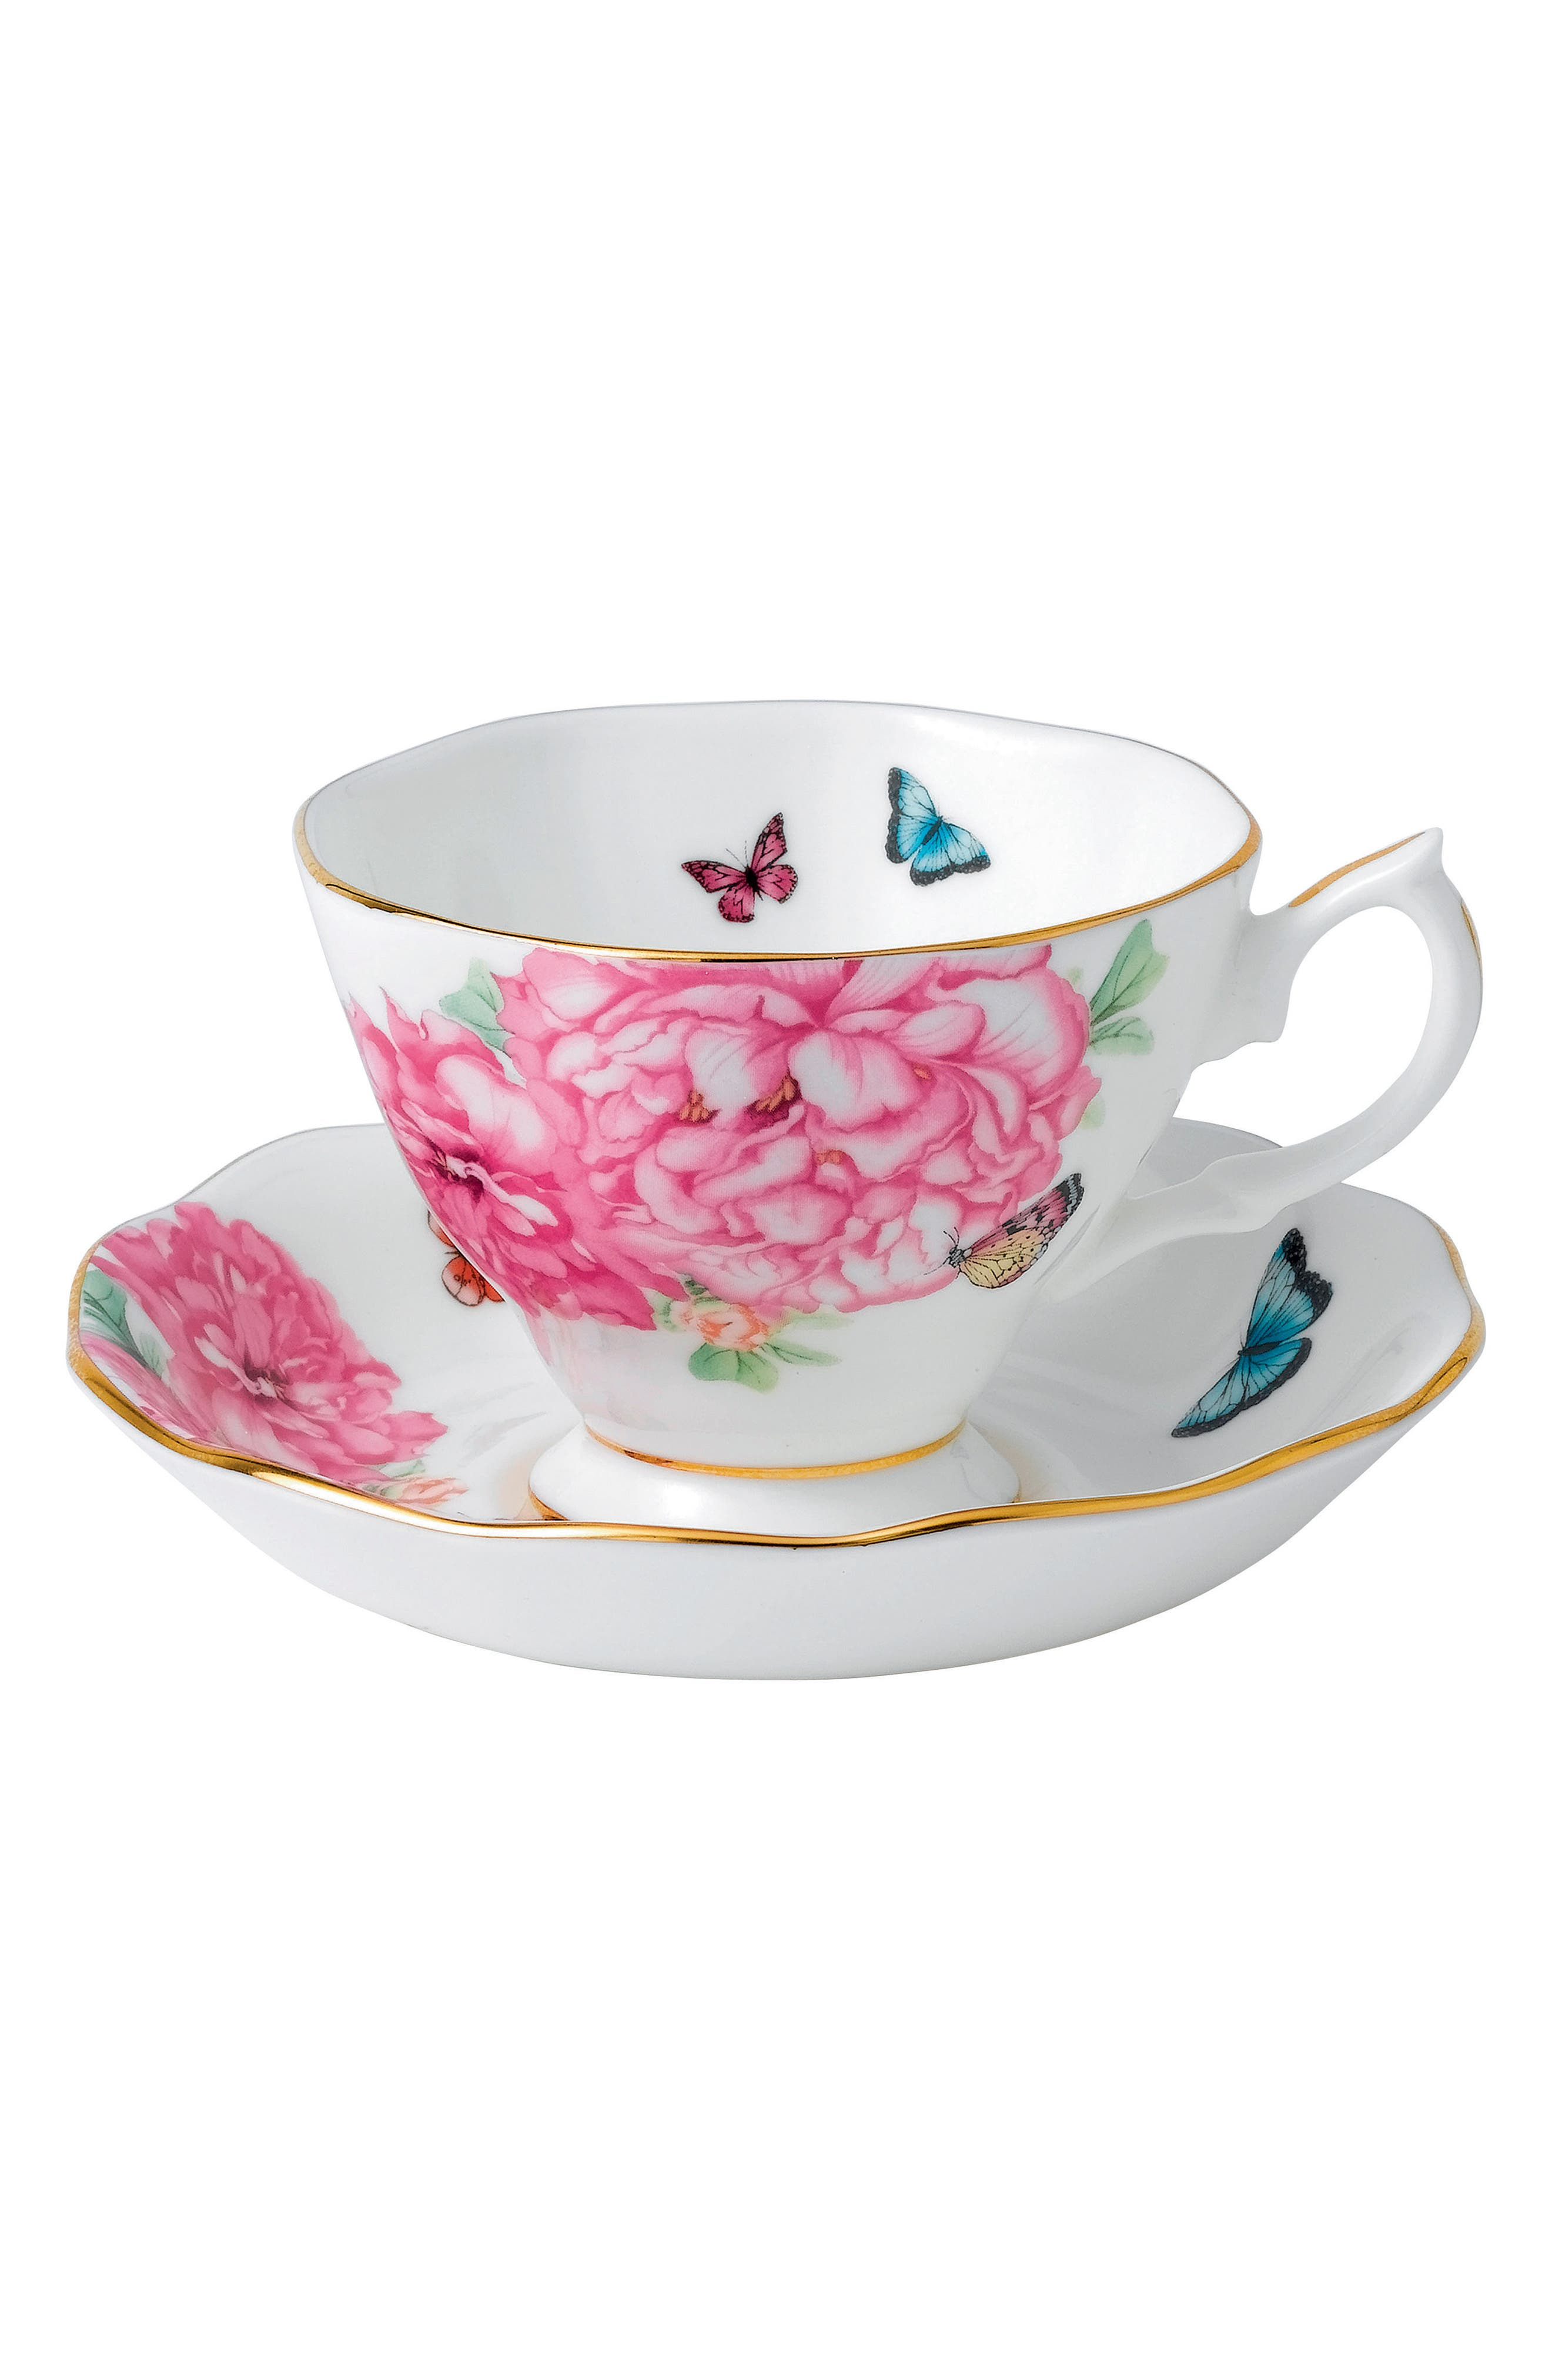 Alternate Image 1 Selected - Miranda Kerr for Royal Albert Friendship Teacup & Saucer